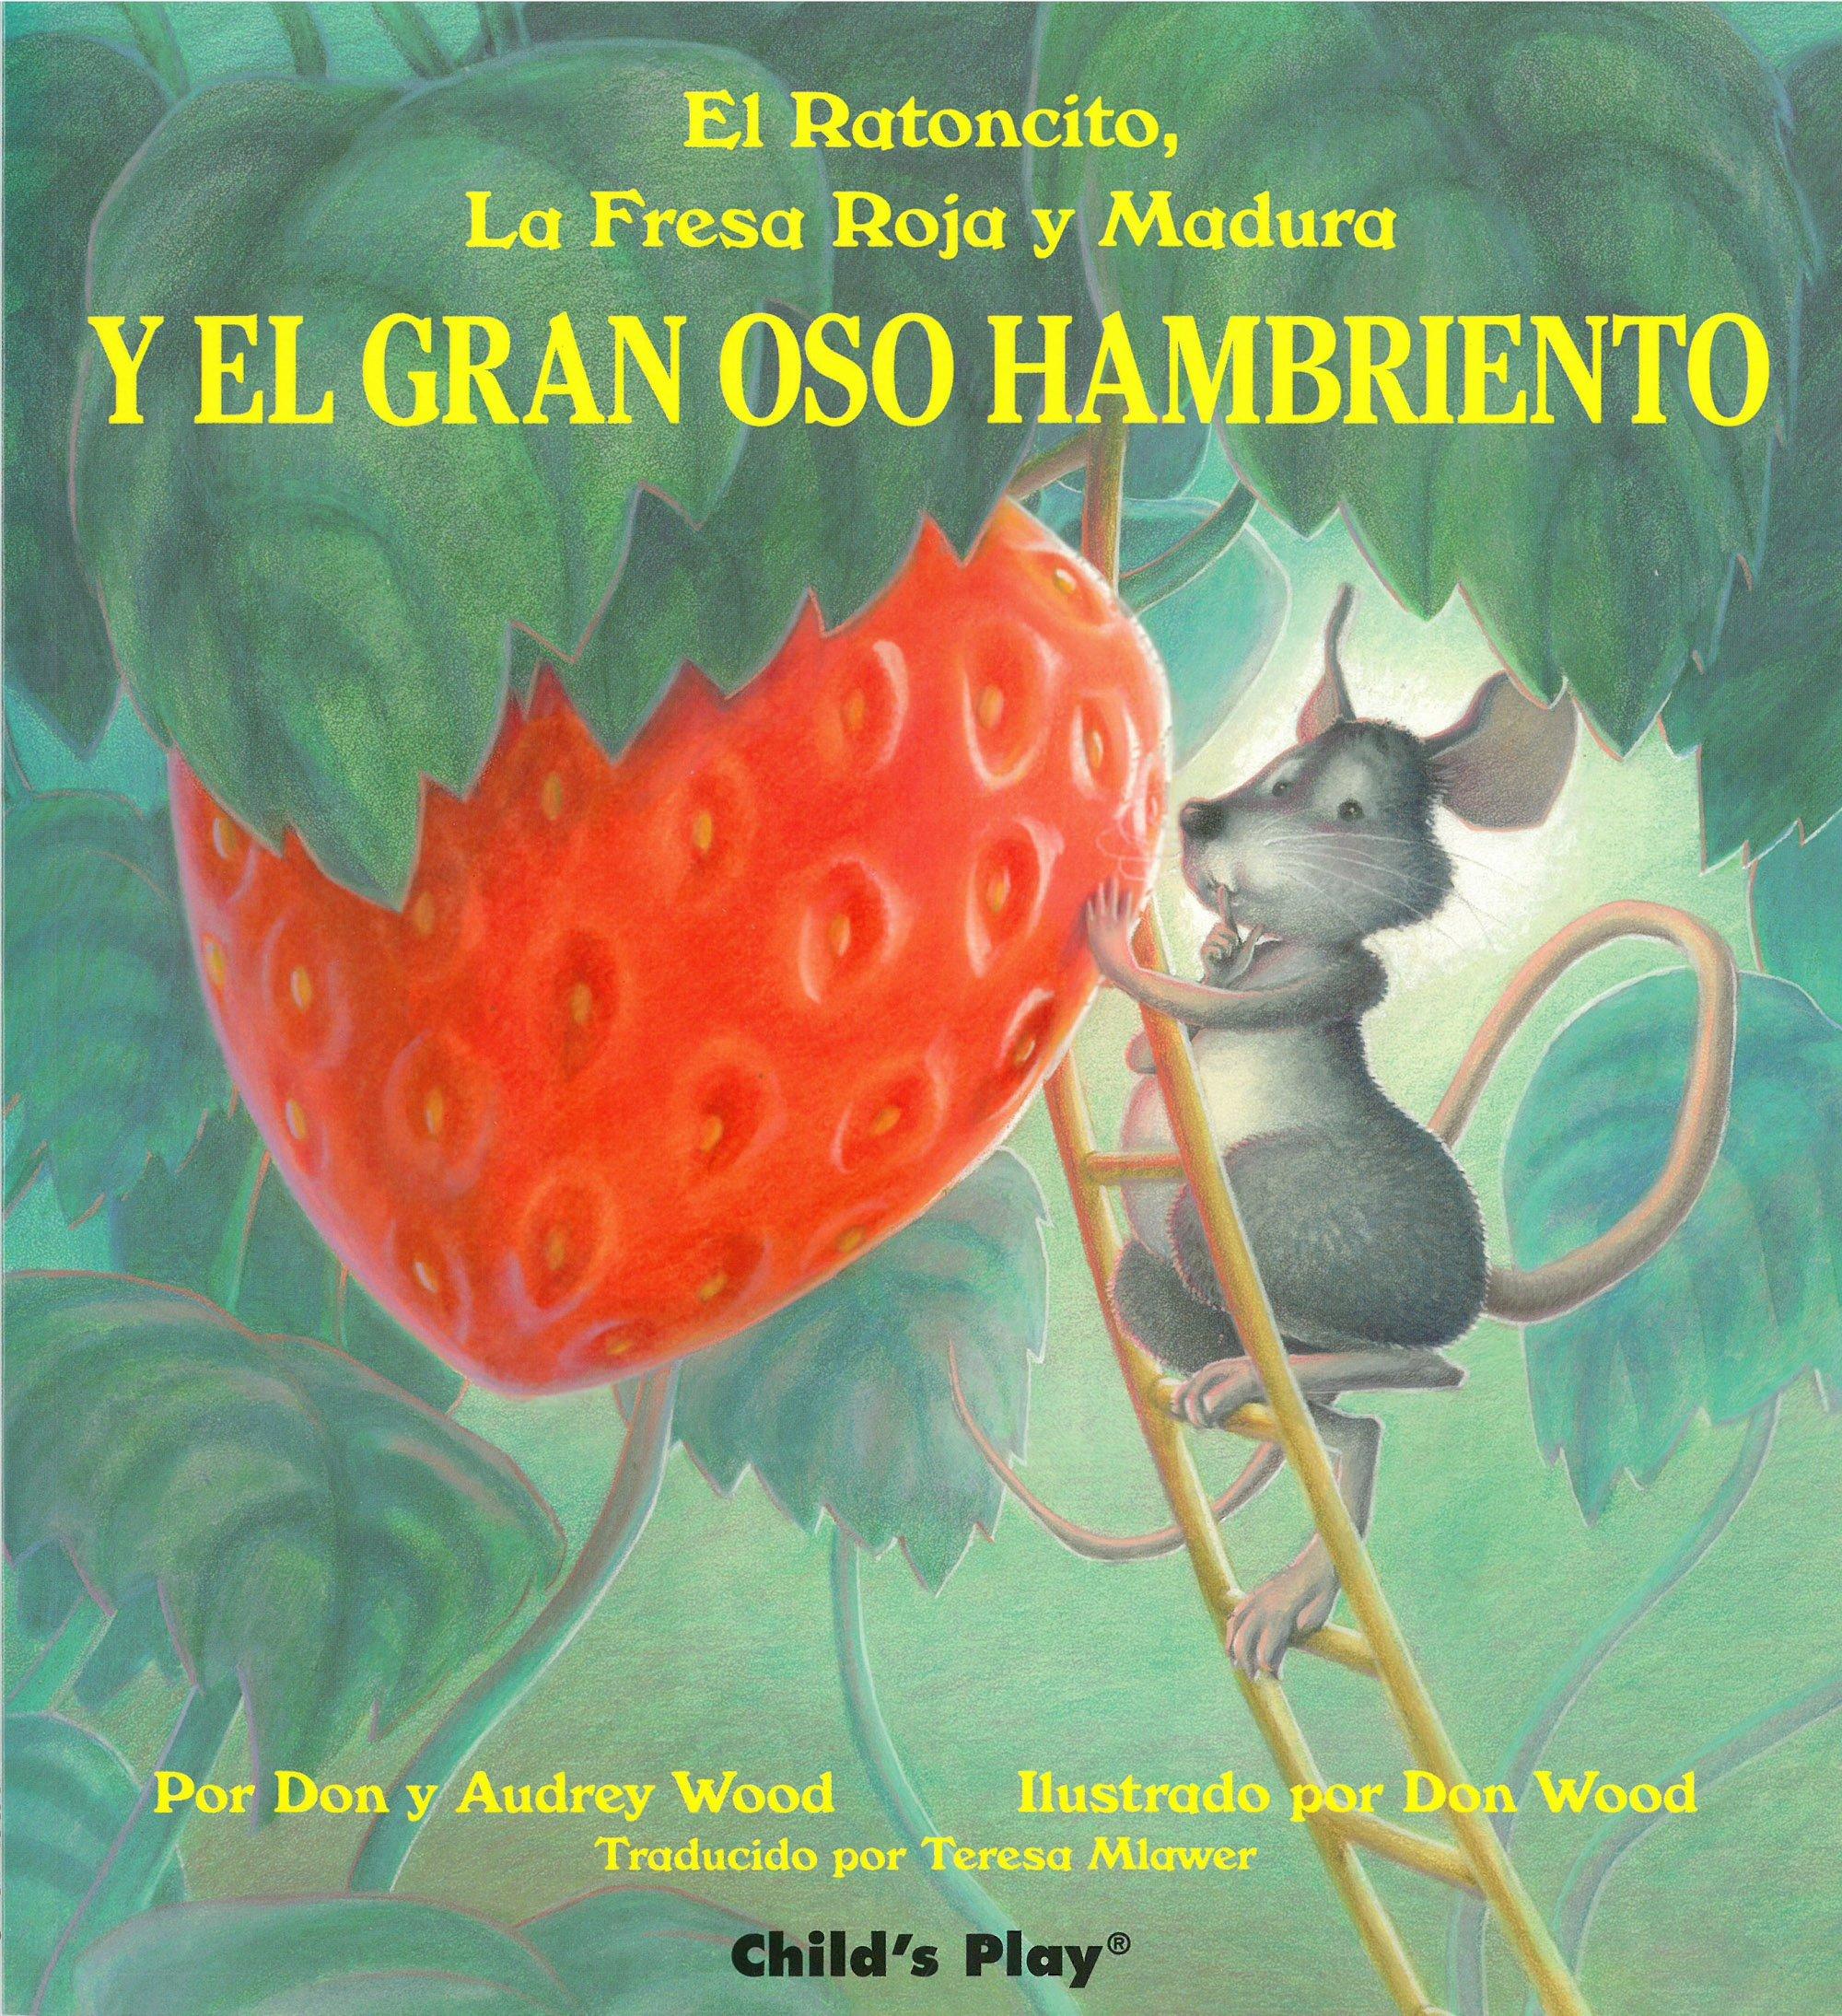 Ratoncito Fresa Roja Madura Hambriento product image